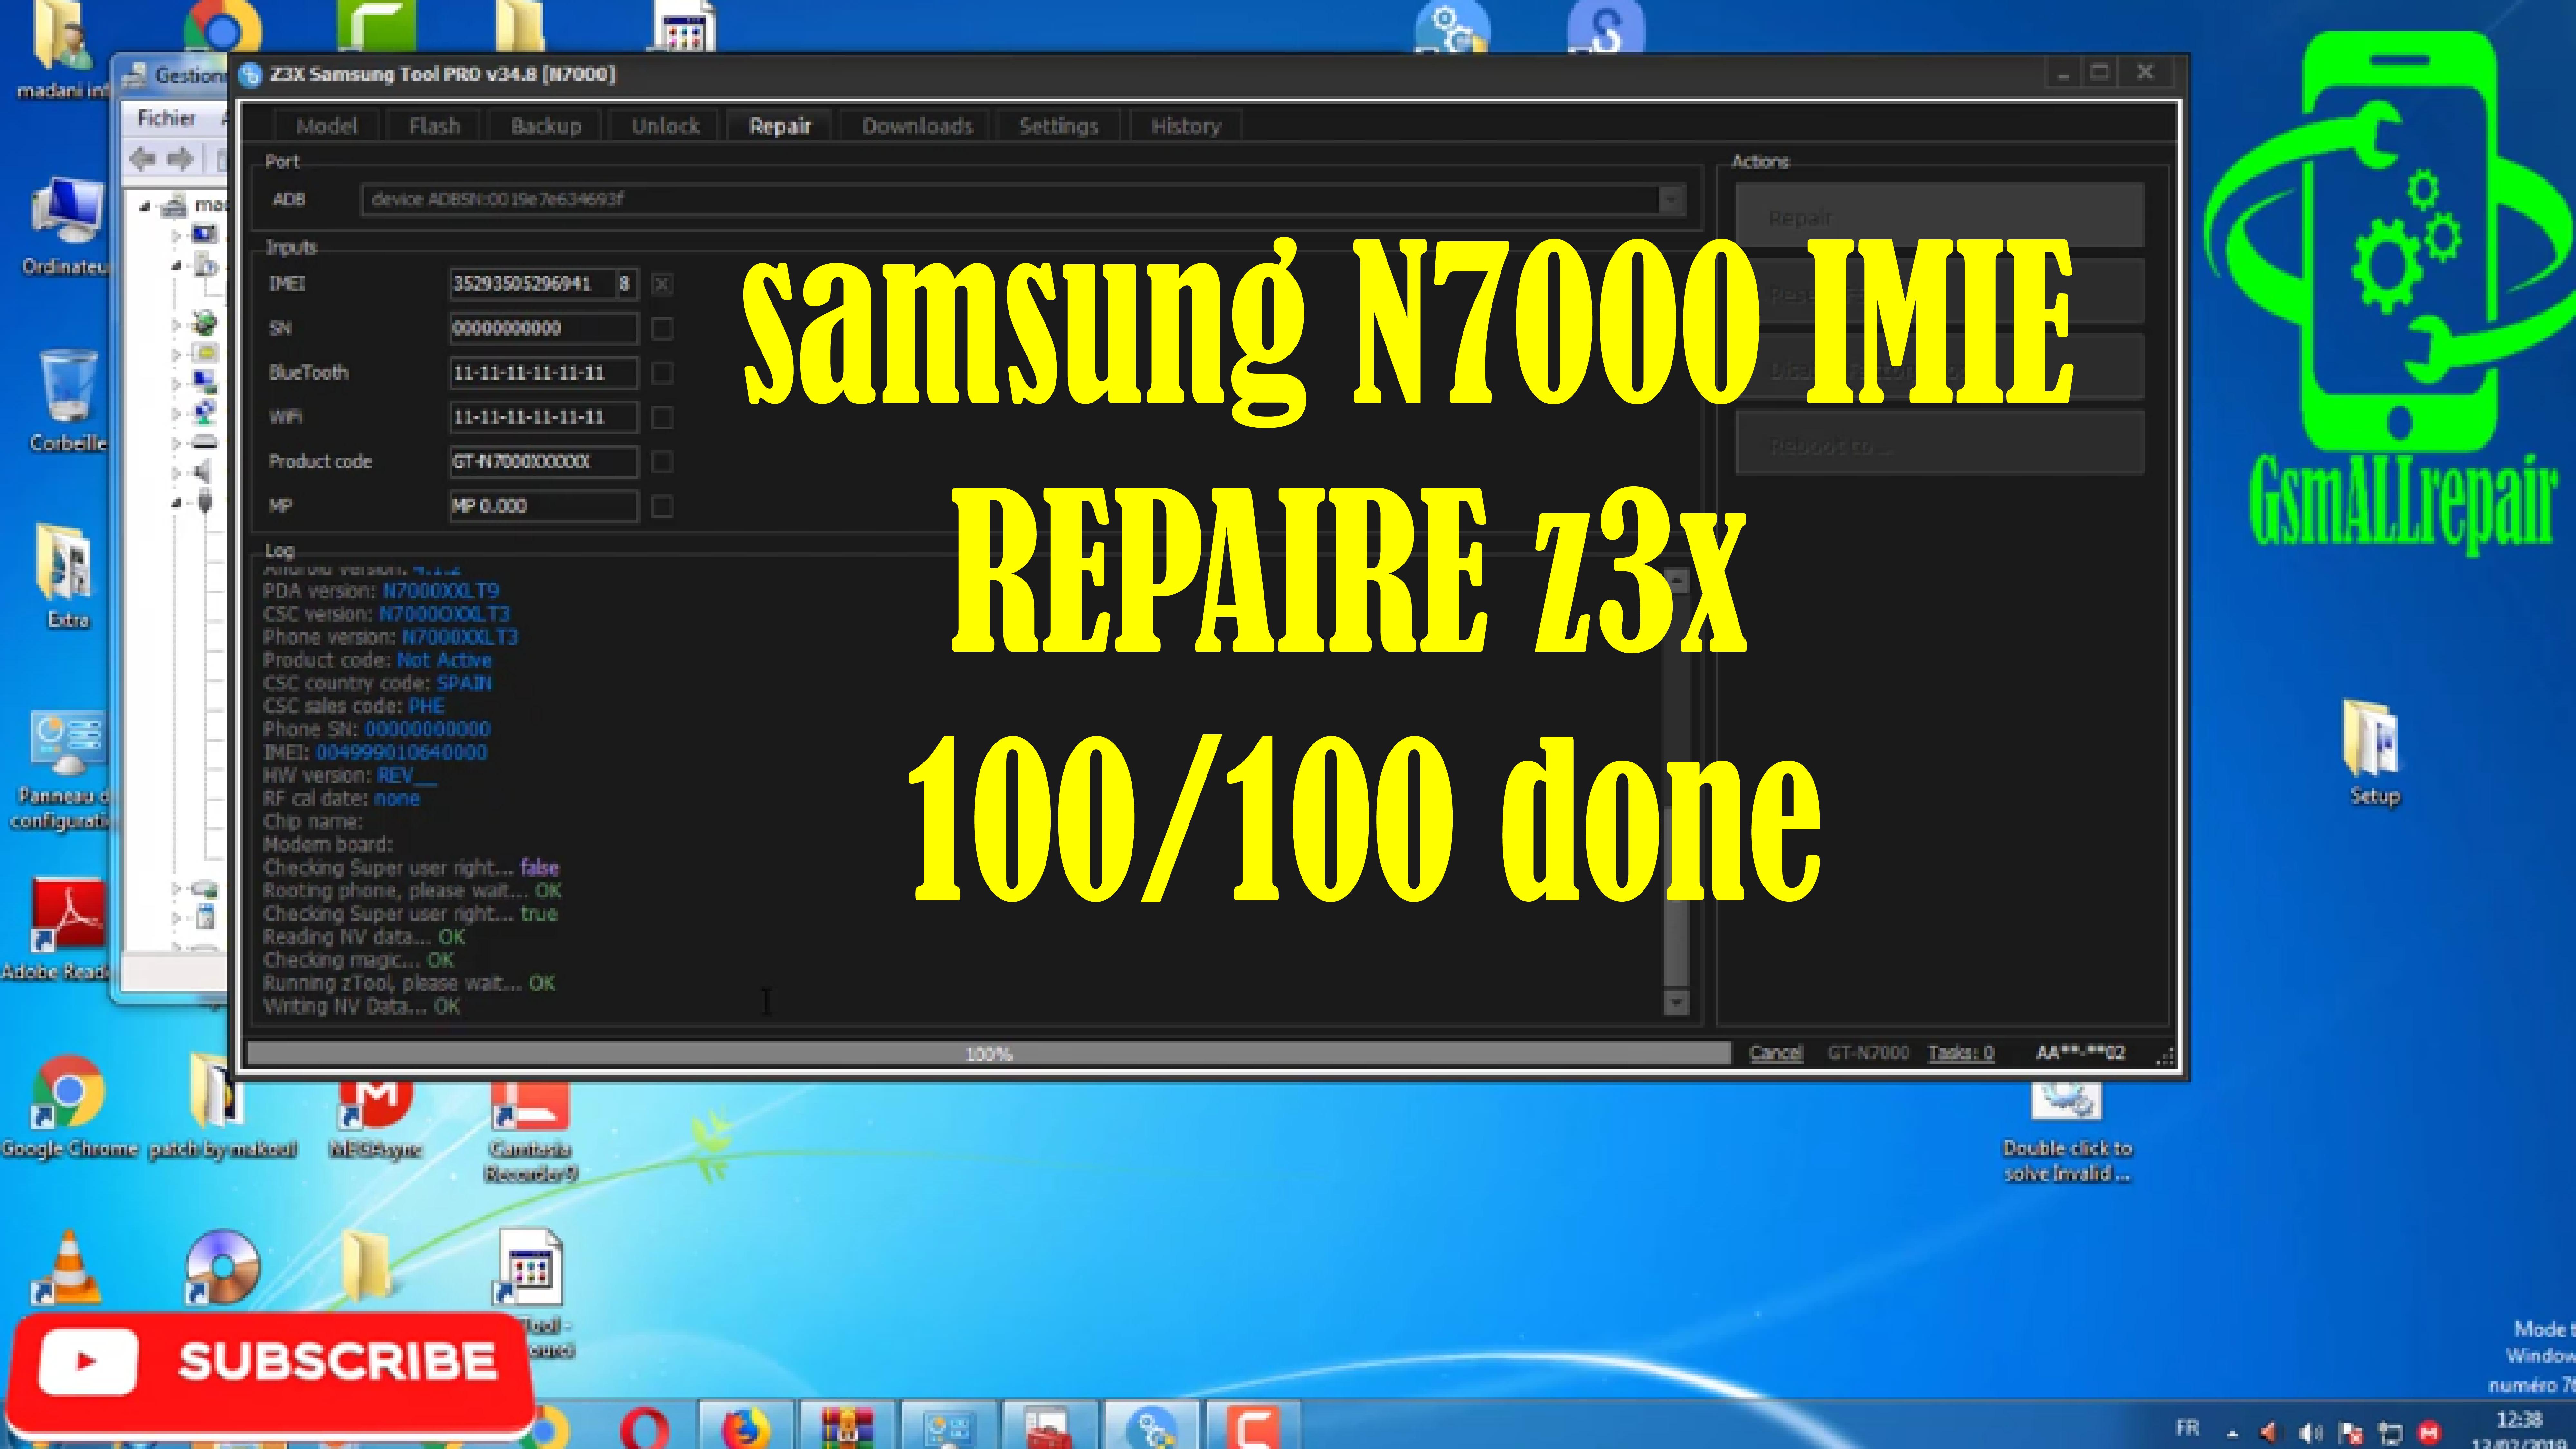 samsung N7000 IMIE REPAIRE z3x 100/100 done | repair imei